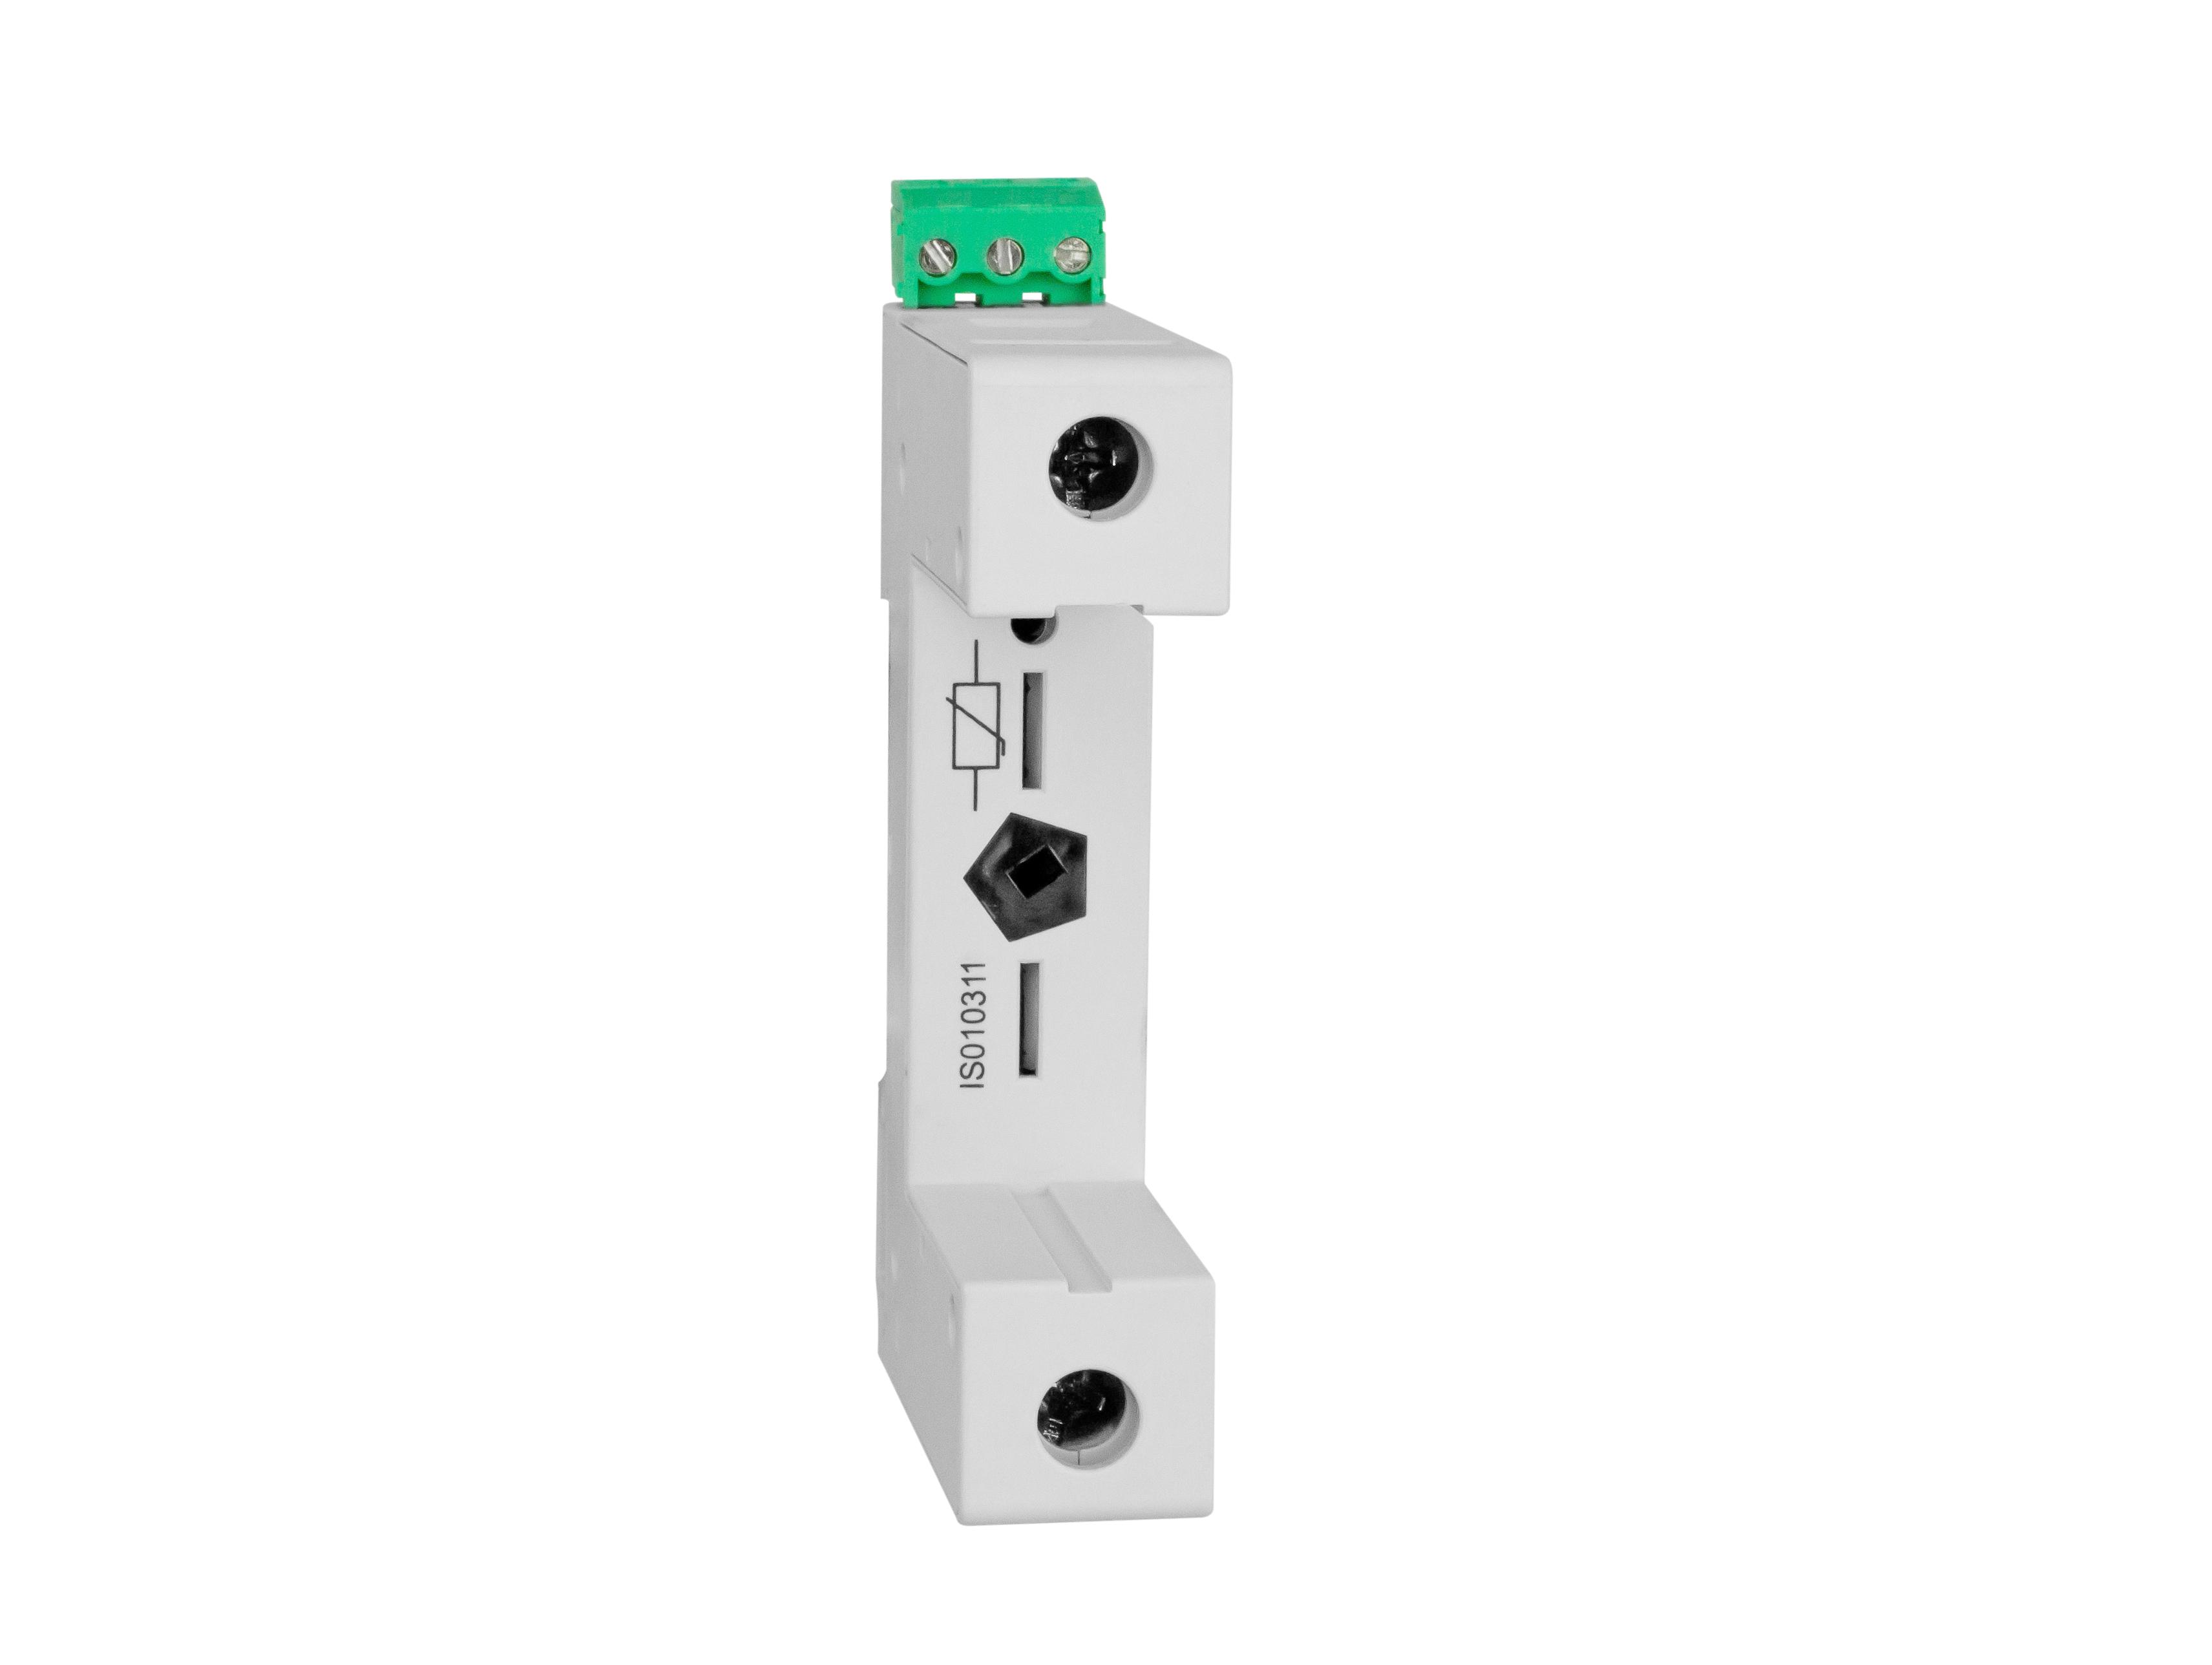 1 Stk Vartec T2,Sockel 1pol. für Varistor-Modul-Einsatz (VVM) + HK IS010311--